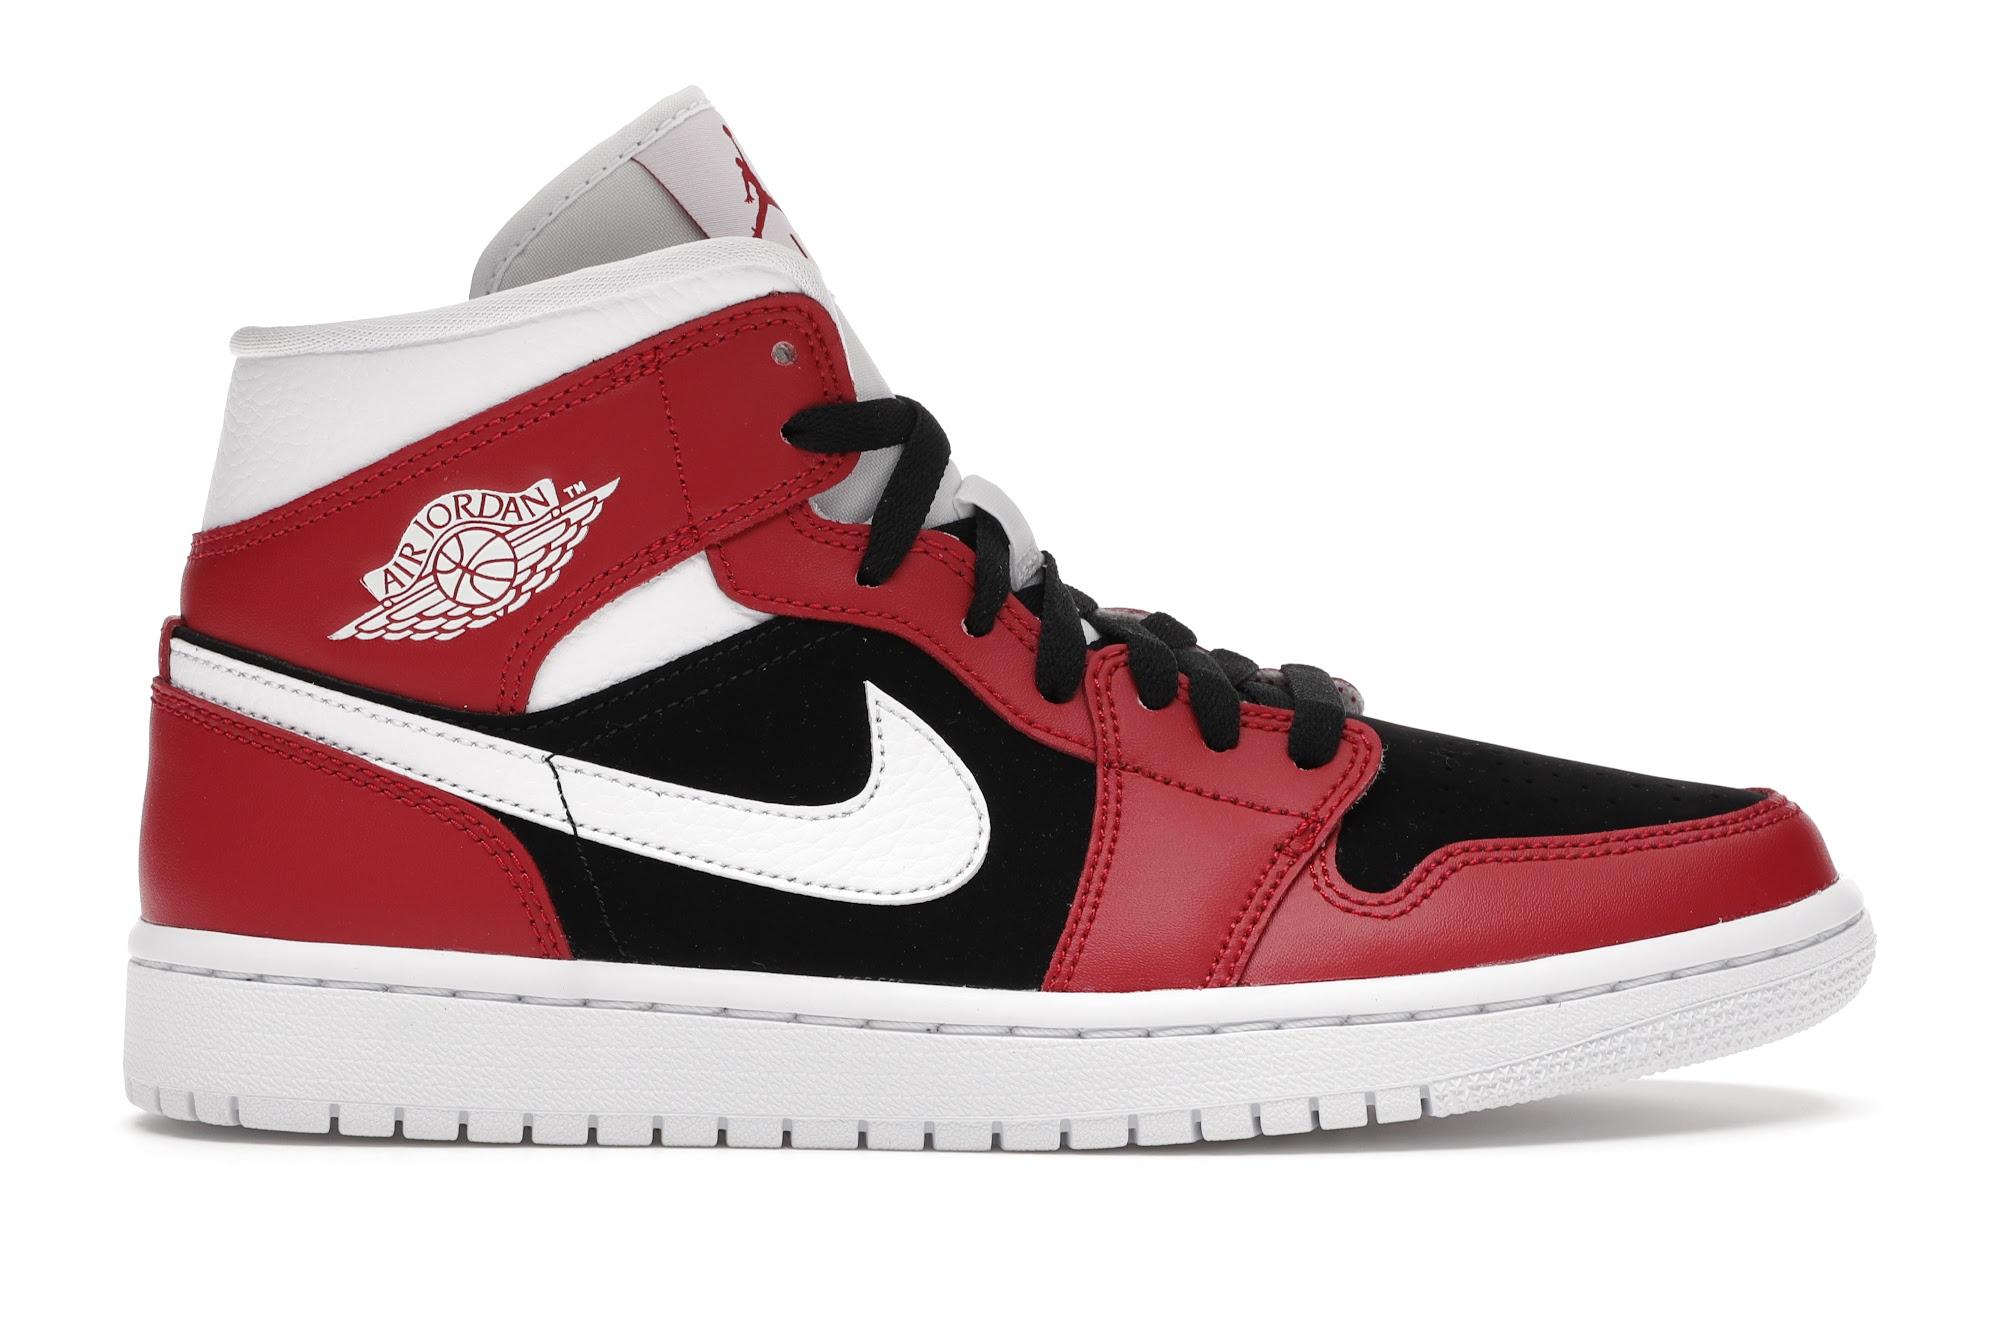 Jordan 1 Mid Gym Red Black (W) - BQ6472-601